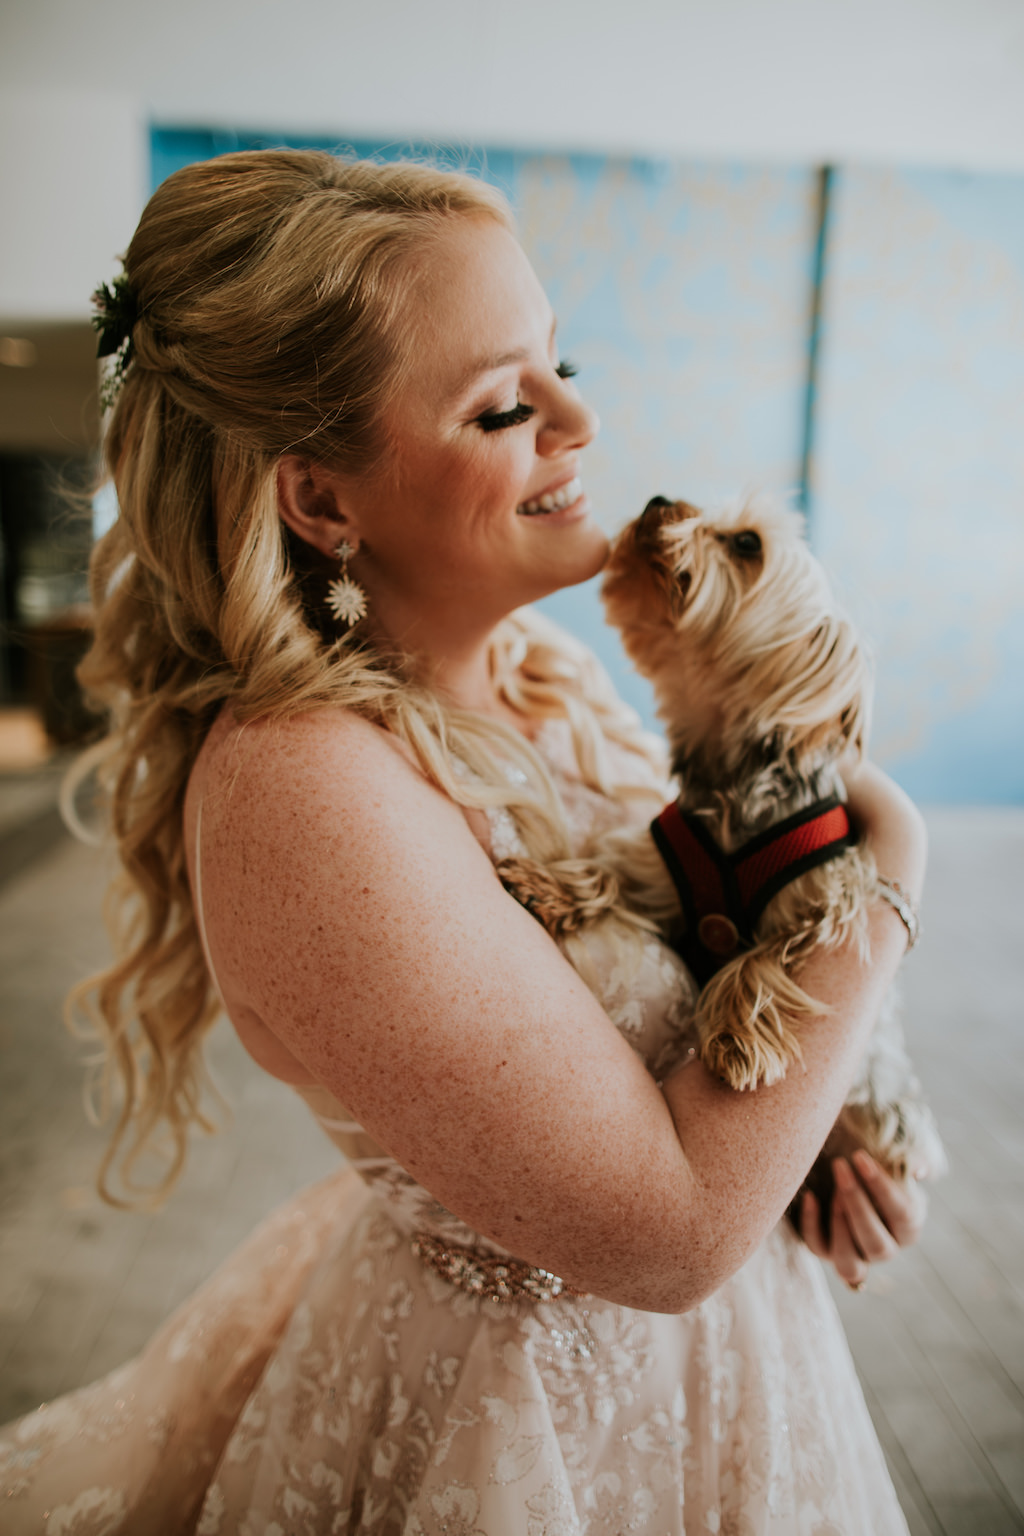 Tampa Bay Bride Beauty Wedding Portrait with Yorkie Dog Kissing